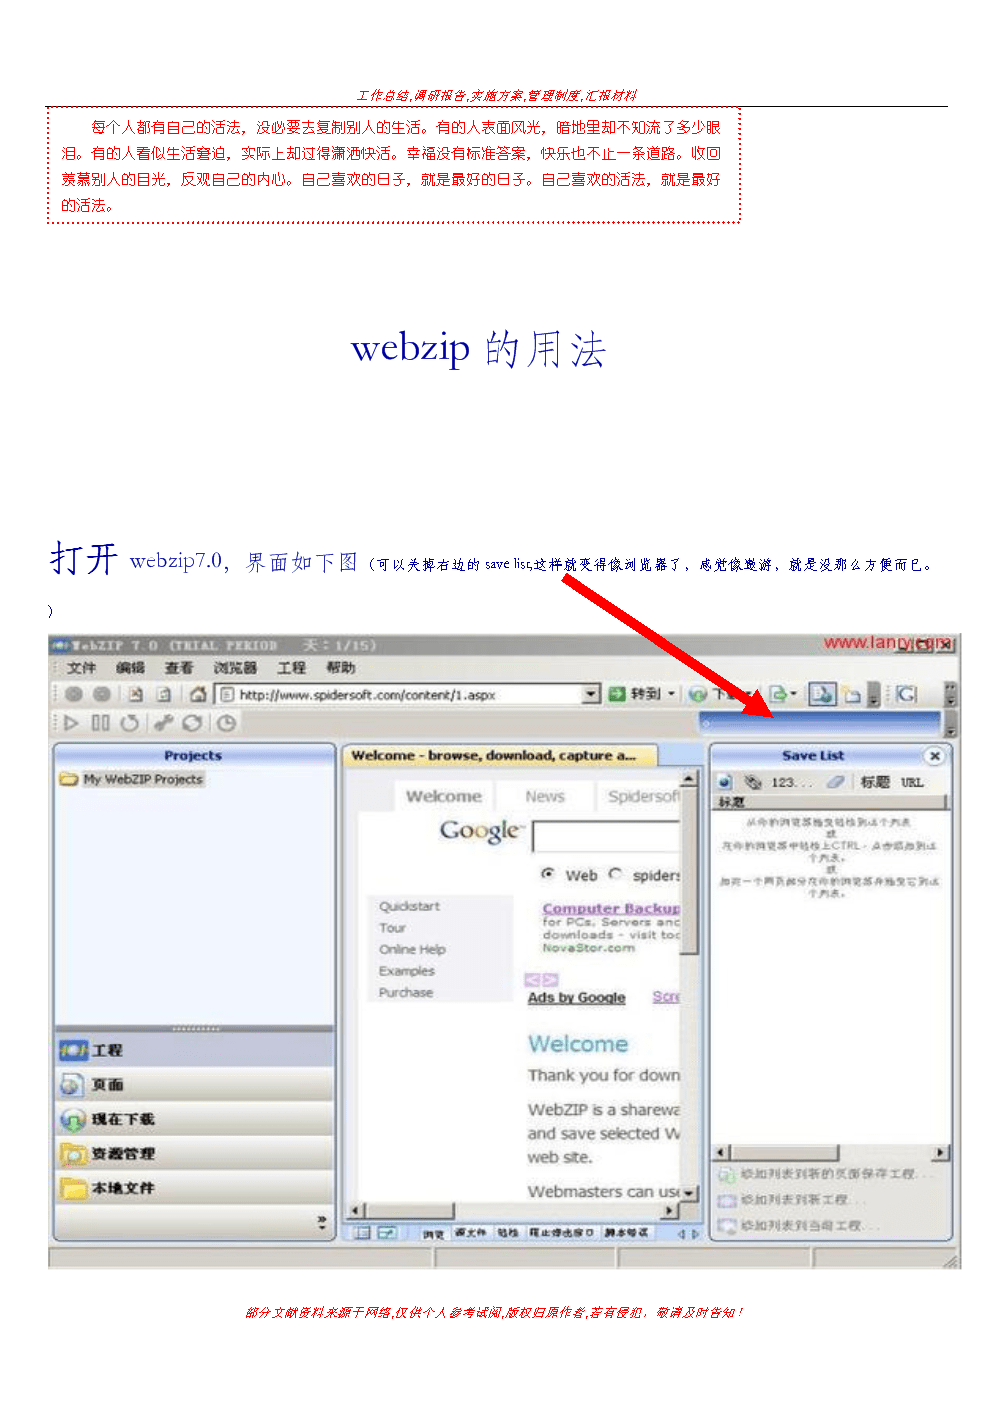 webzip使用方法图解教程.doc